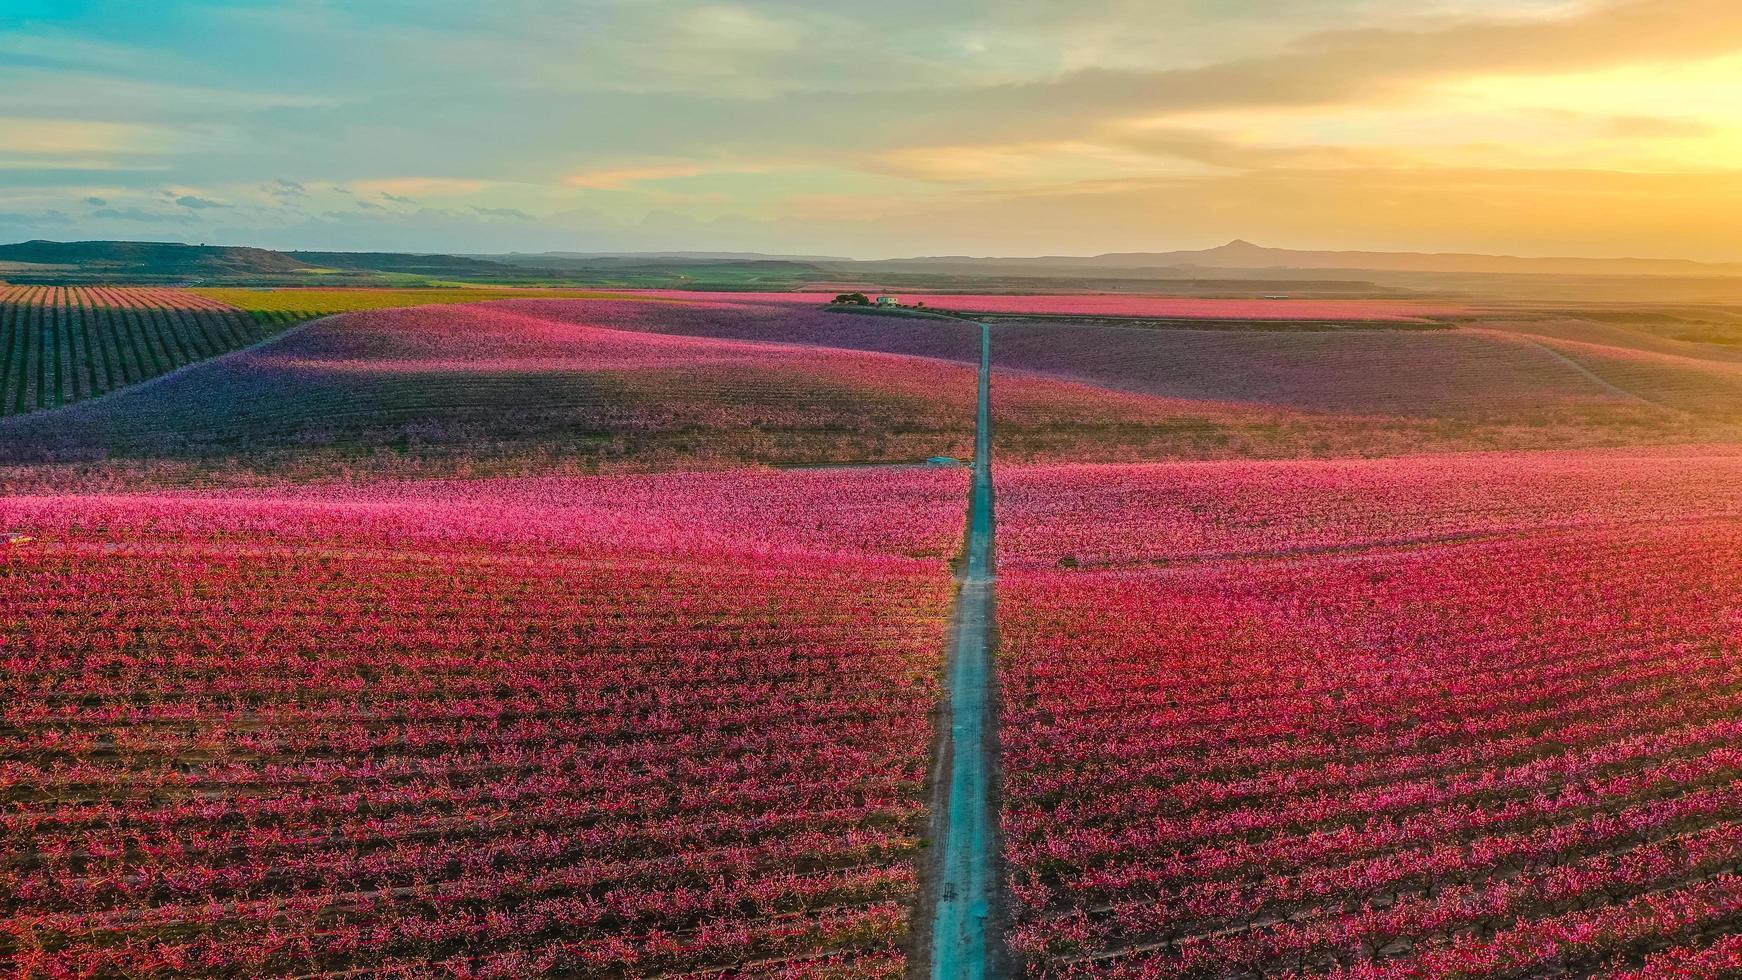 rode bloem veld bij zonsondergang foto